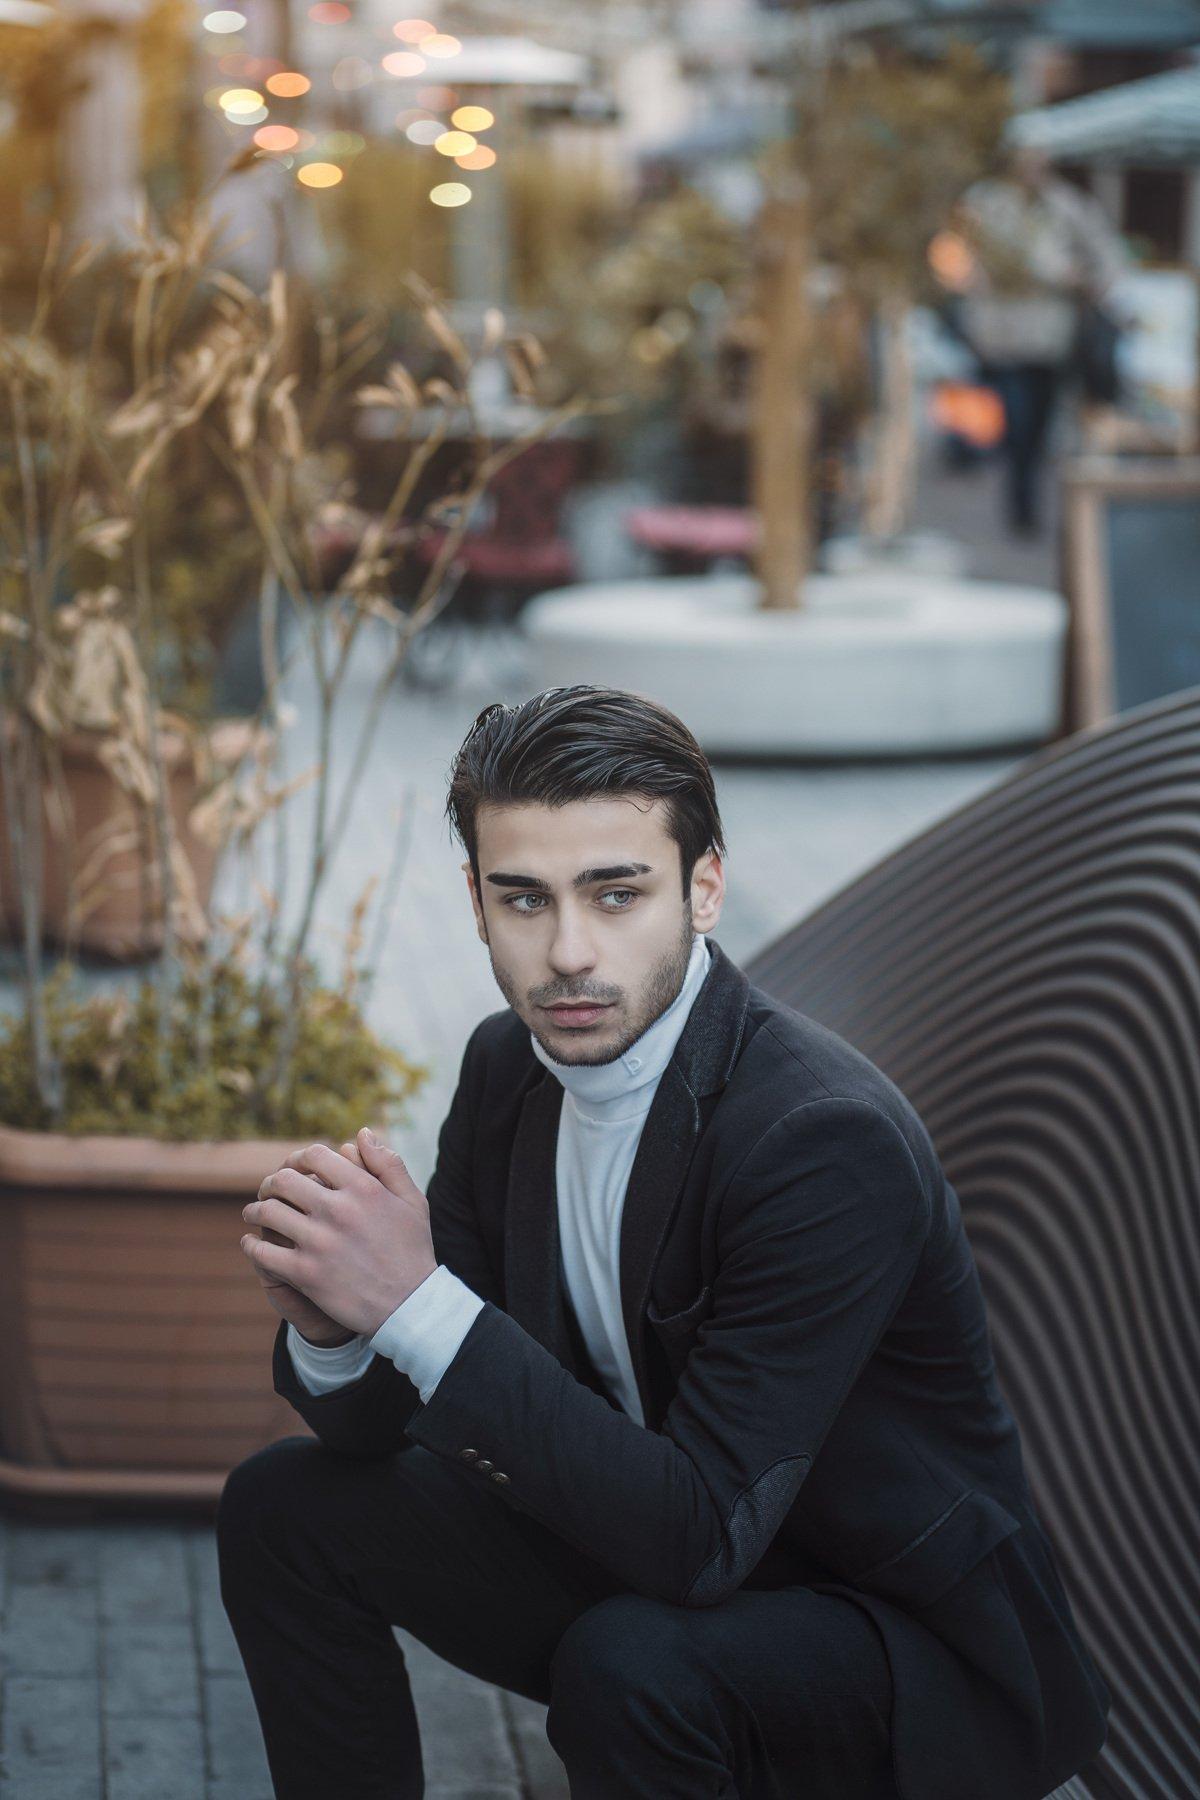 #man #art #portrat, Giorgi Solomnishvili PHOTOGRAPHY